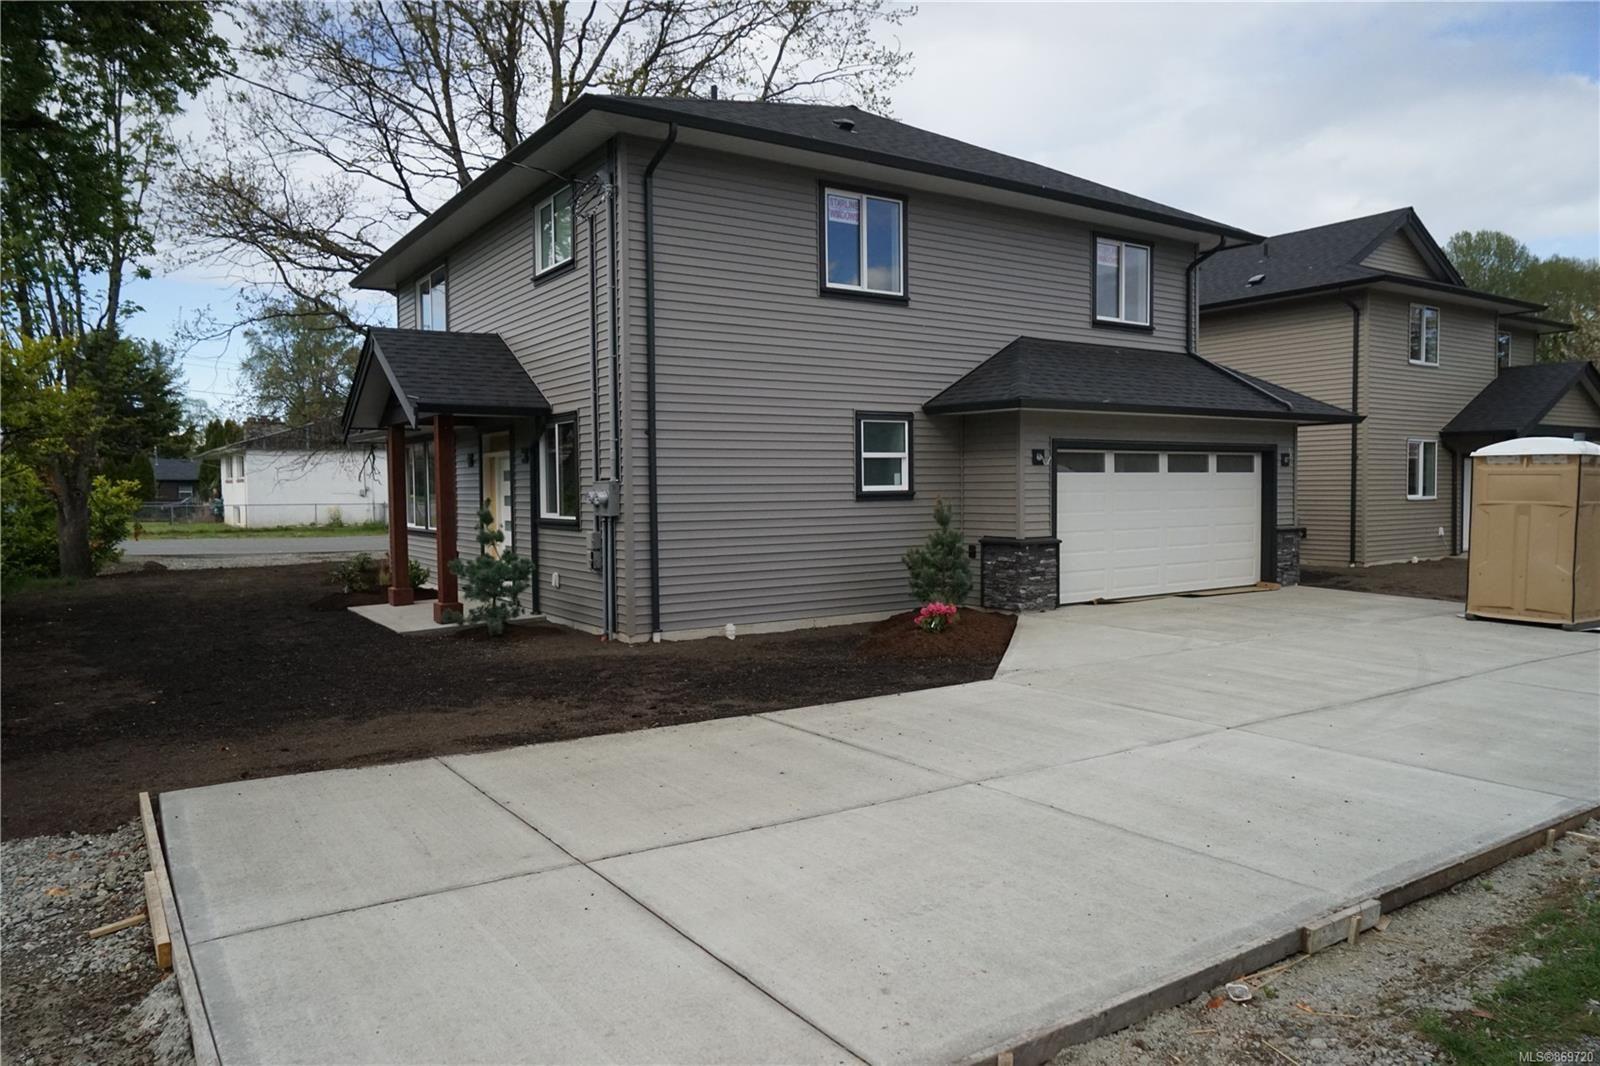 Main Photo: 770 Bruce Ave in : Na South Nanaimo House for sale (Nanaimo)  : MLS®# 869720